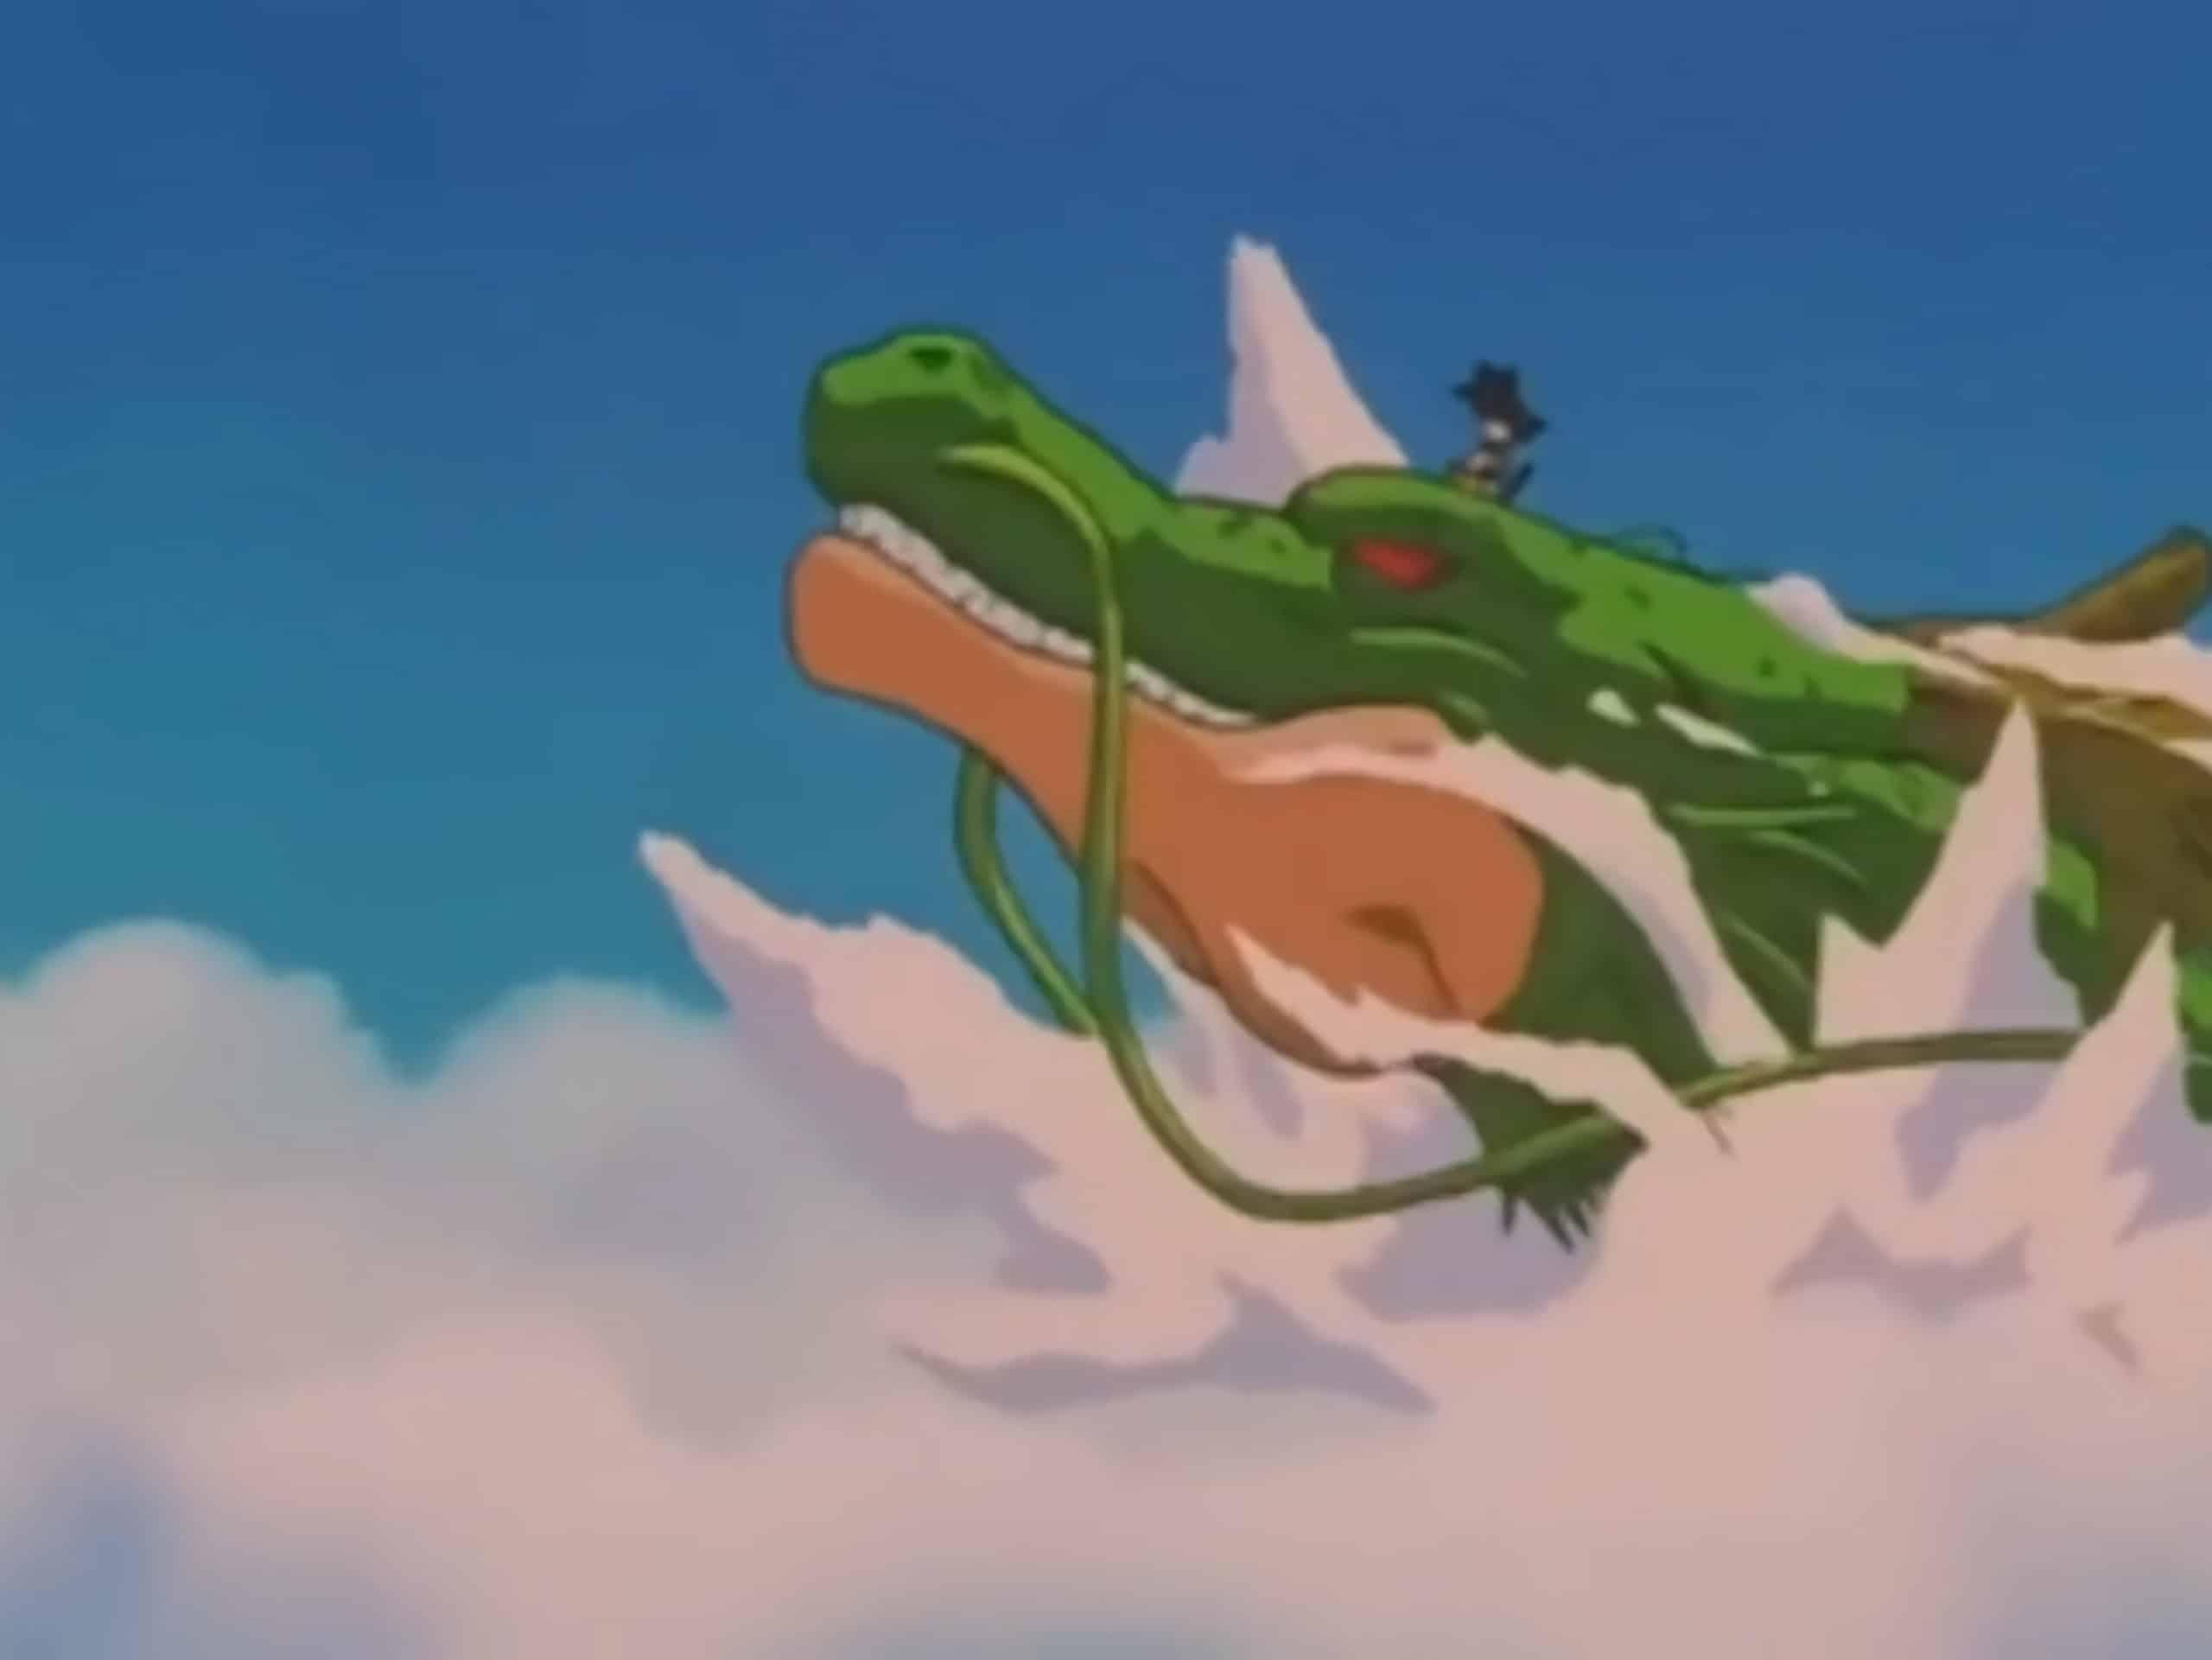 Goku bambino di GT sopra il Drago Shenron